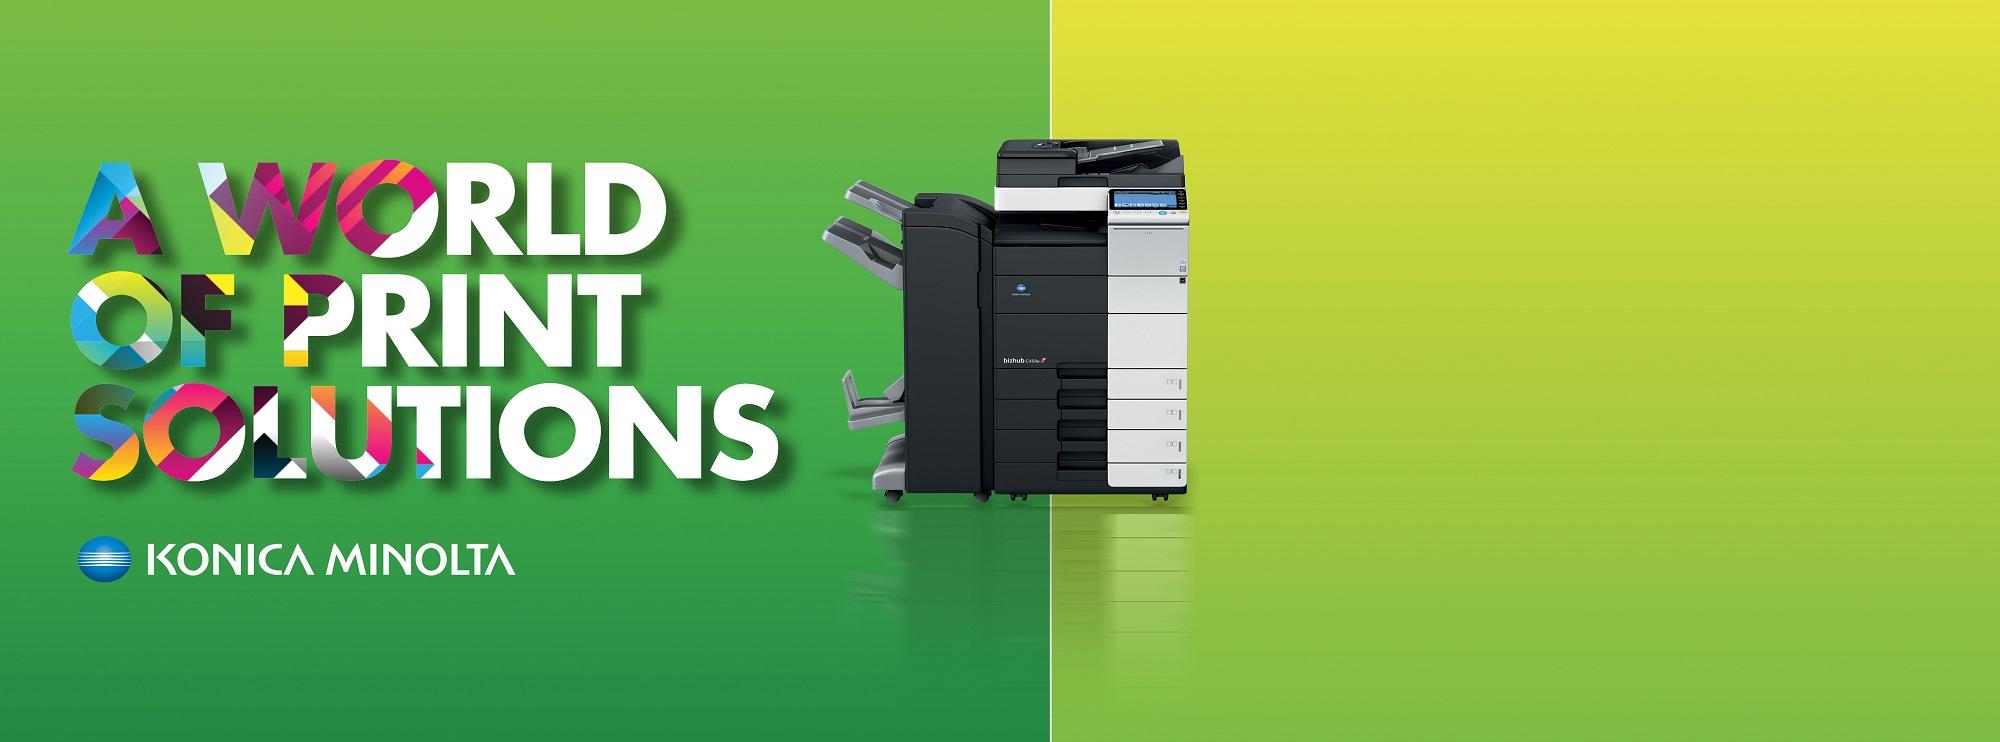 14 222 printers bunners 2000x7426 1, מדפסות לייזר צבע, מדפסות לייזר צבעוניות, מדפסות לייזר לעסק, מדפסות לייזר למשרד